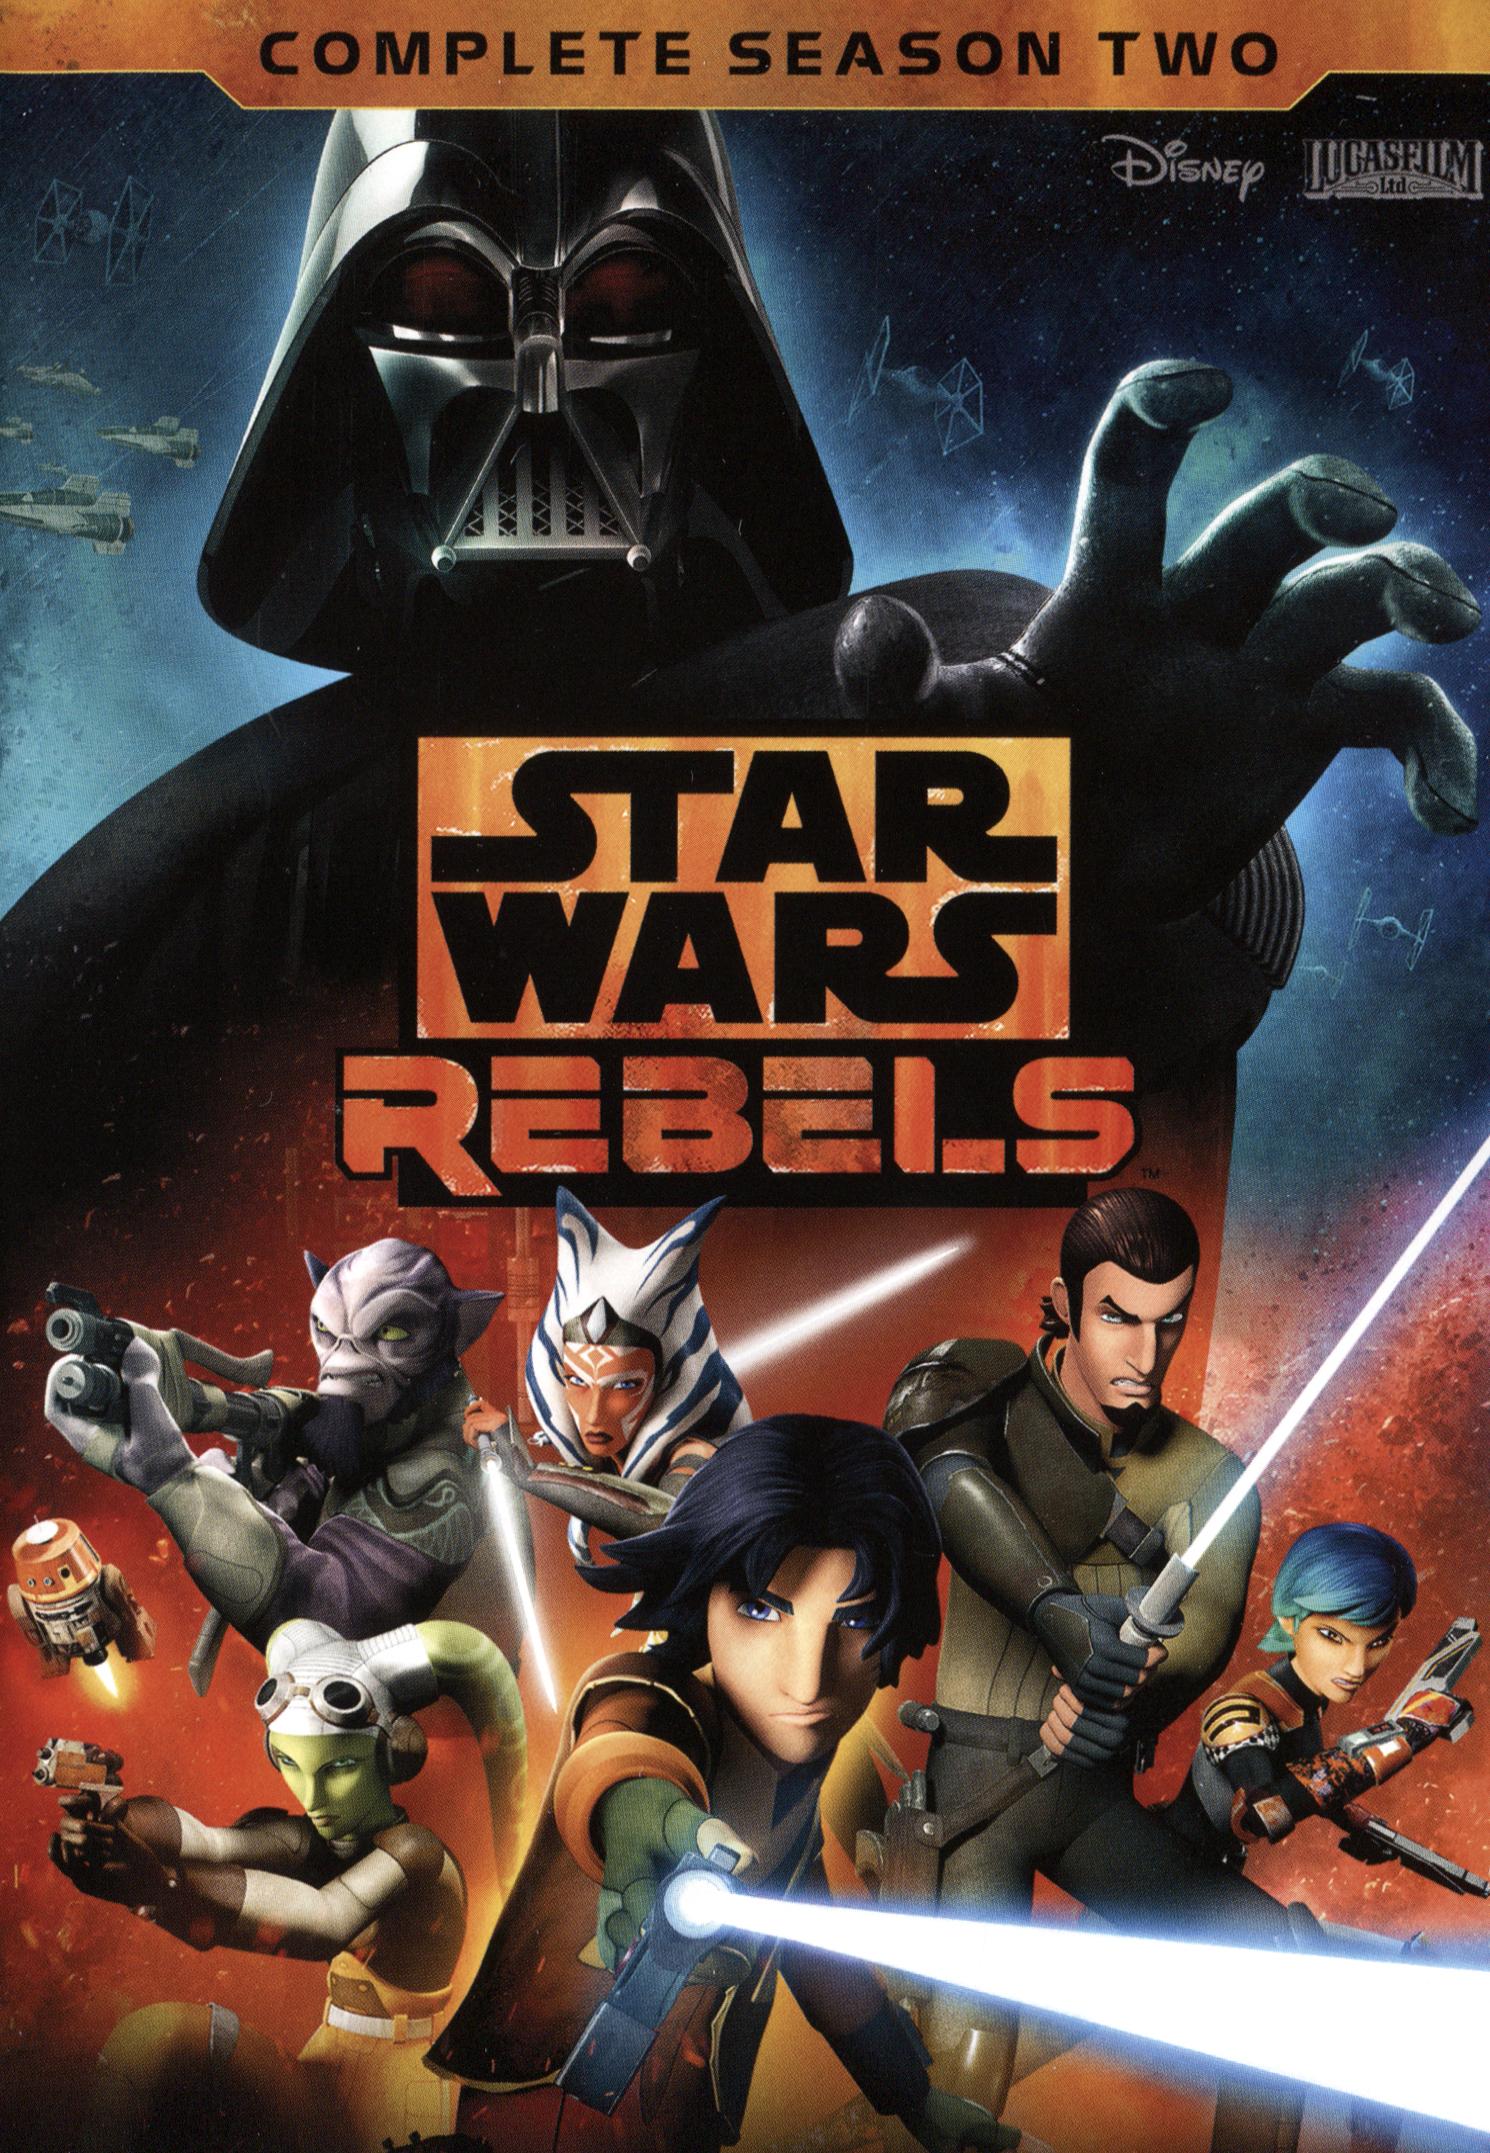 Star Wars Rebels: The Complete Season 2 [4 Discs] (dvd) 5407100